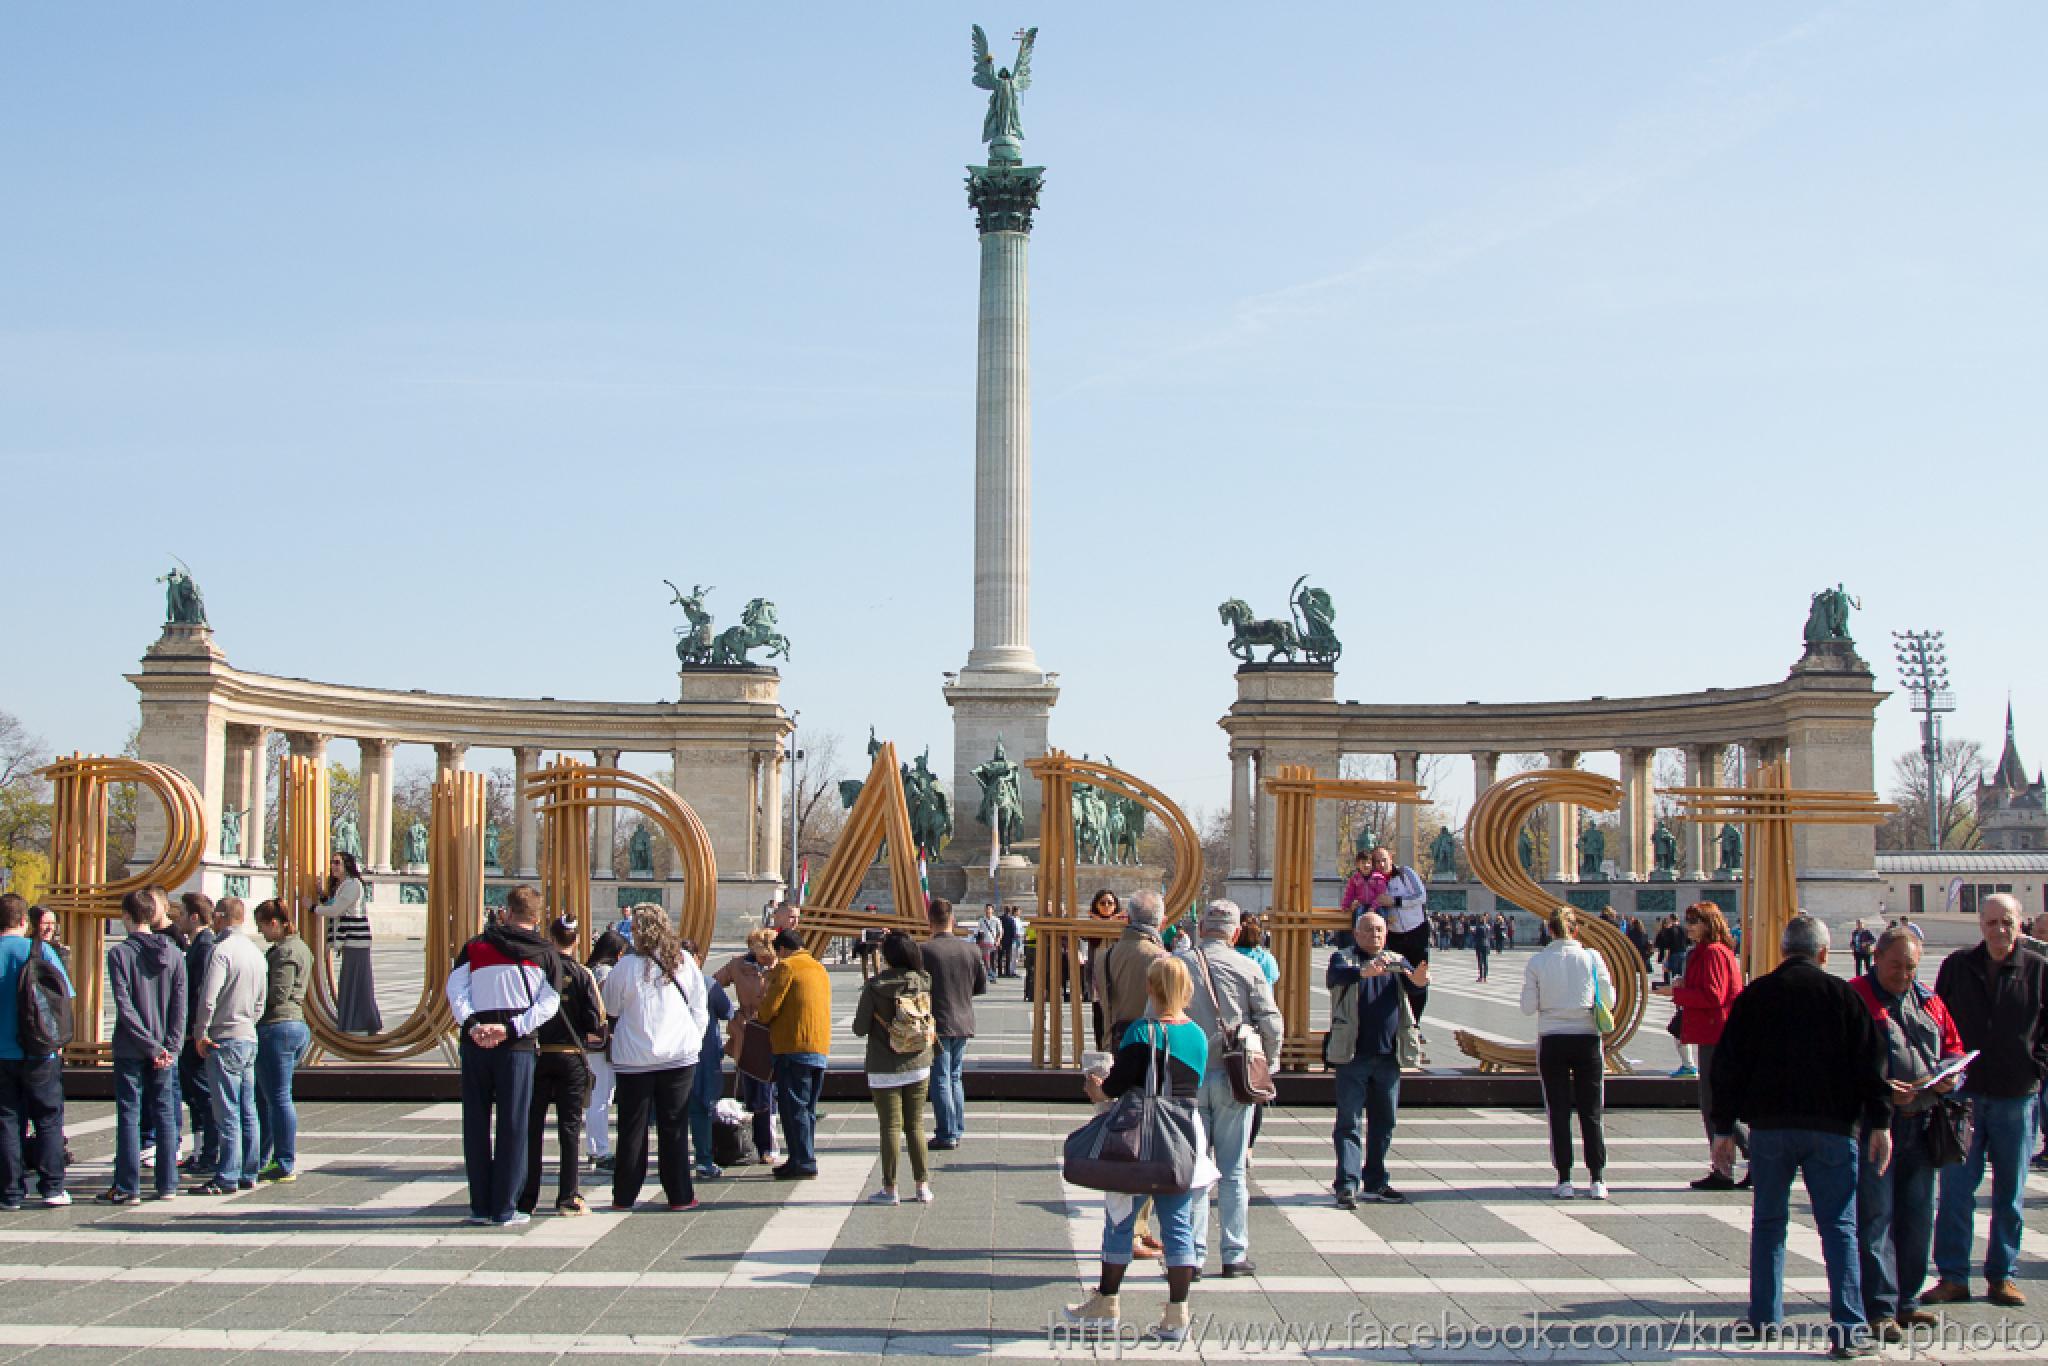 The Heroes' Square by Laszlo J.Kremmer